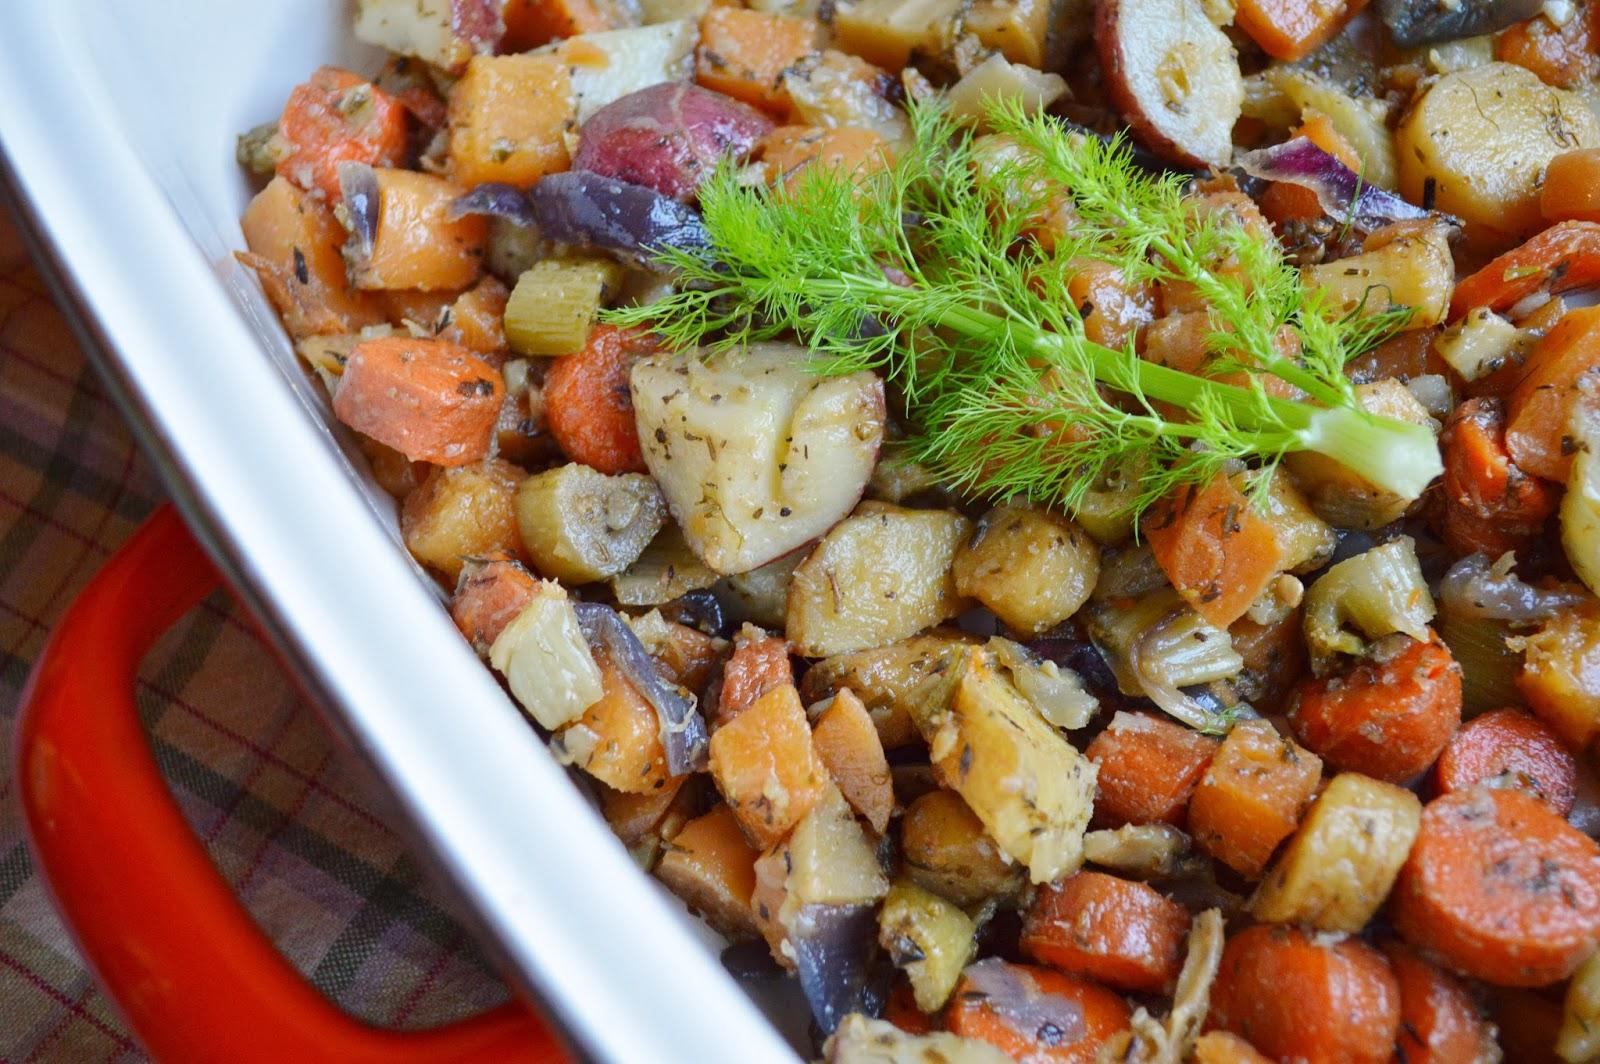 http://www.thegreeneberger.com/p/recipes.html?recipe_id=6058972